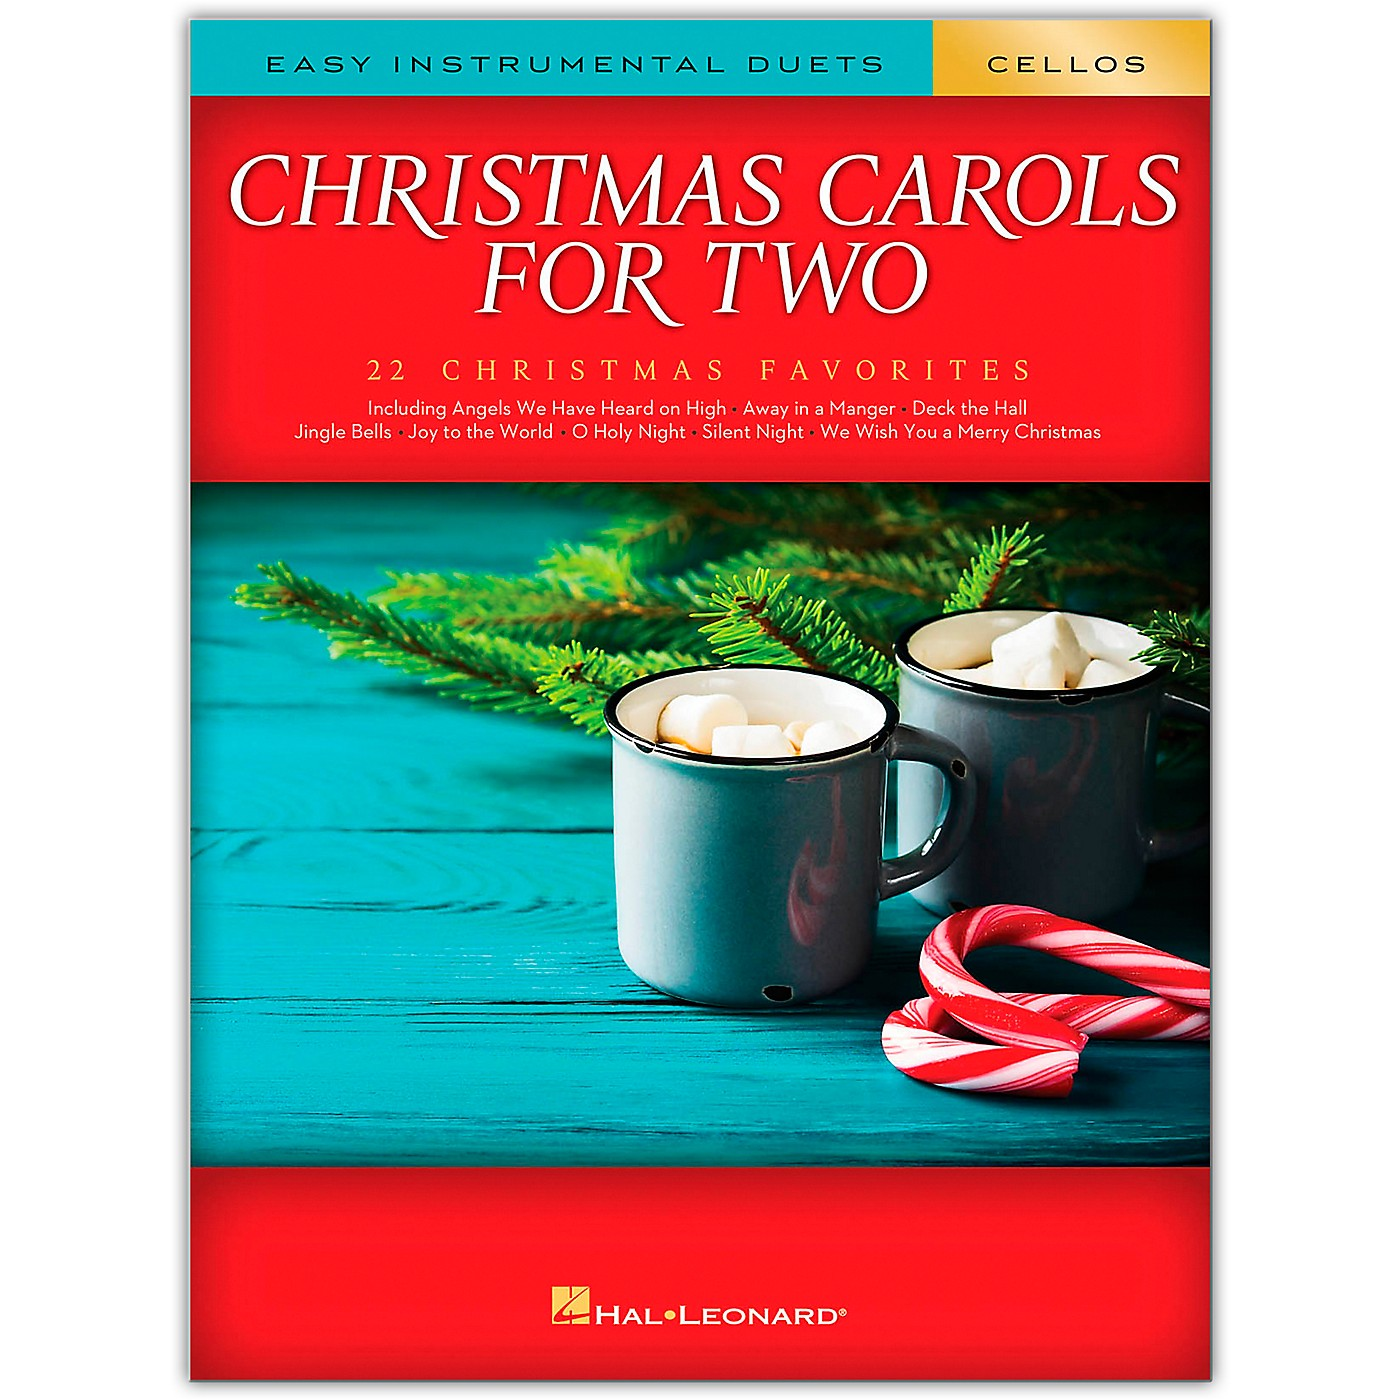 Hal Leonard Christmas Carols for Two Cellos (Easy Instrumental Duets) Songbook thumbnail